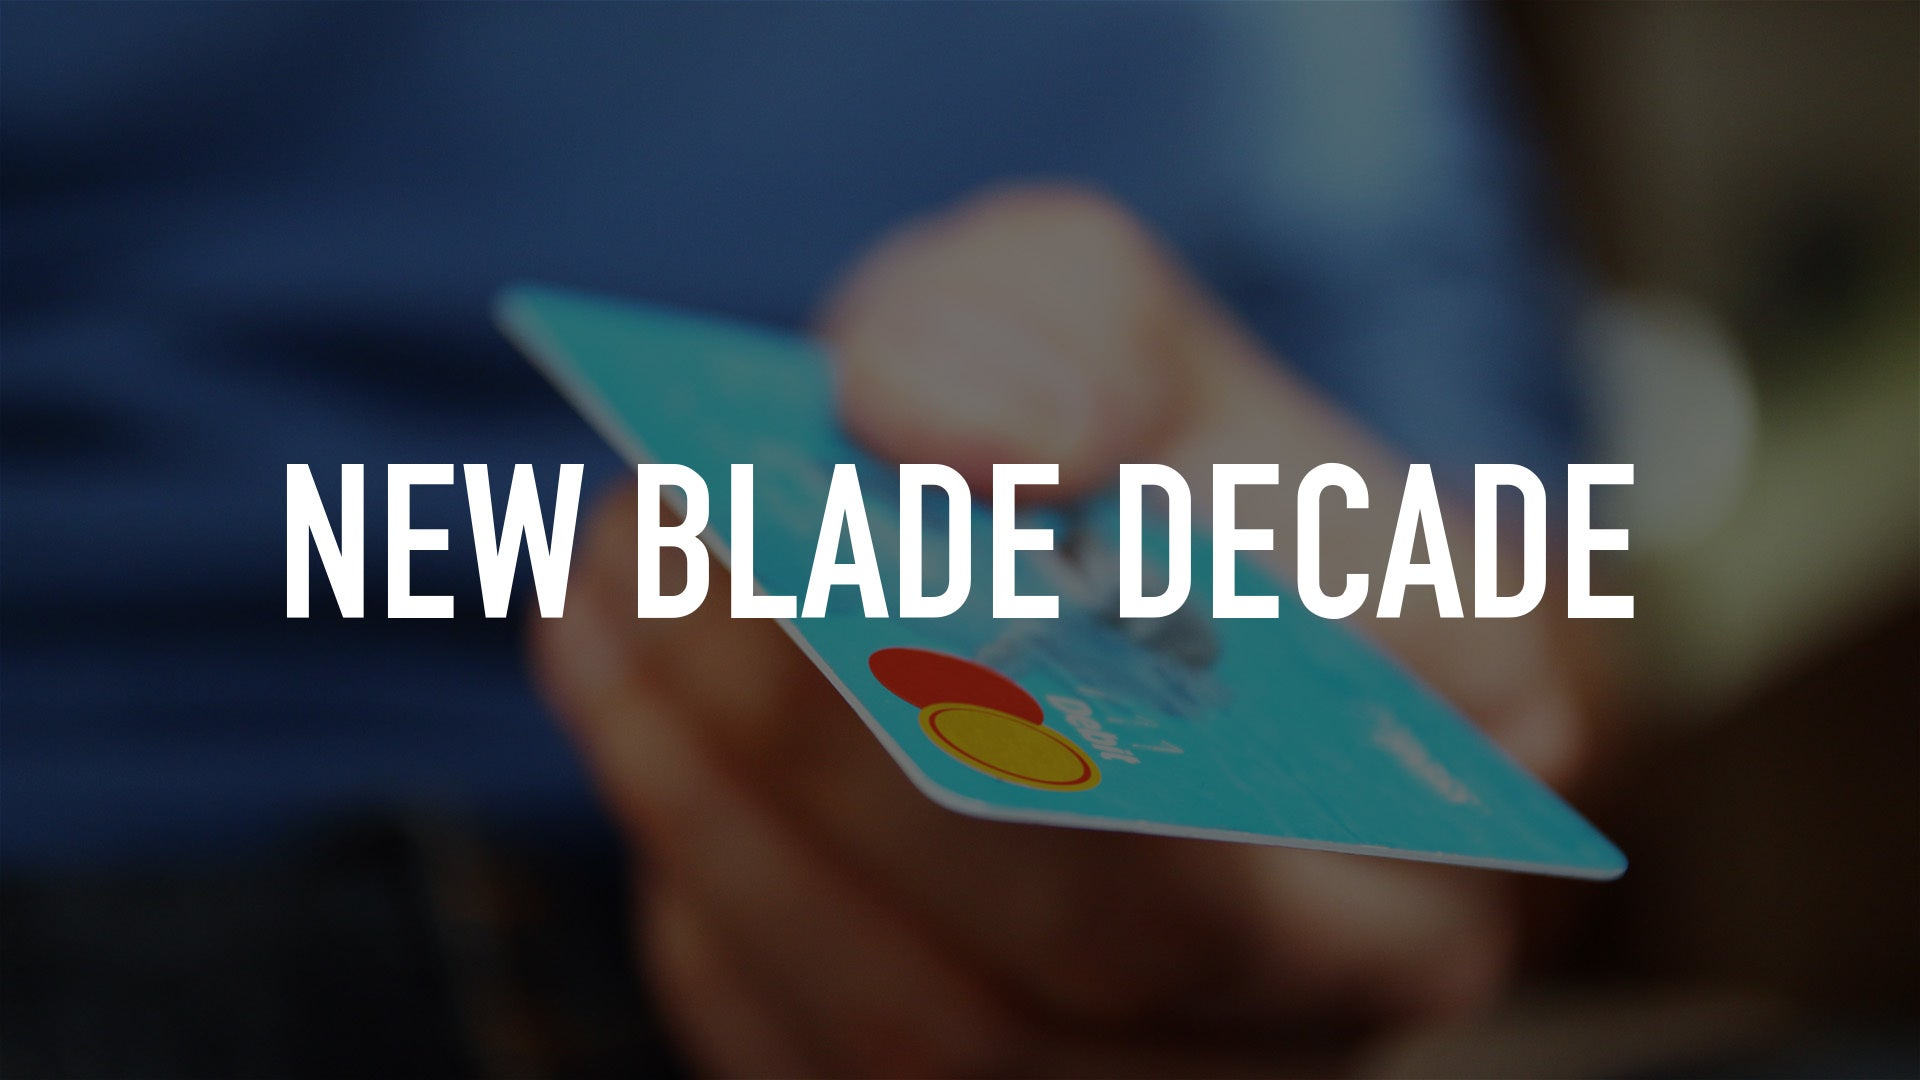 New Blade Decade